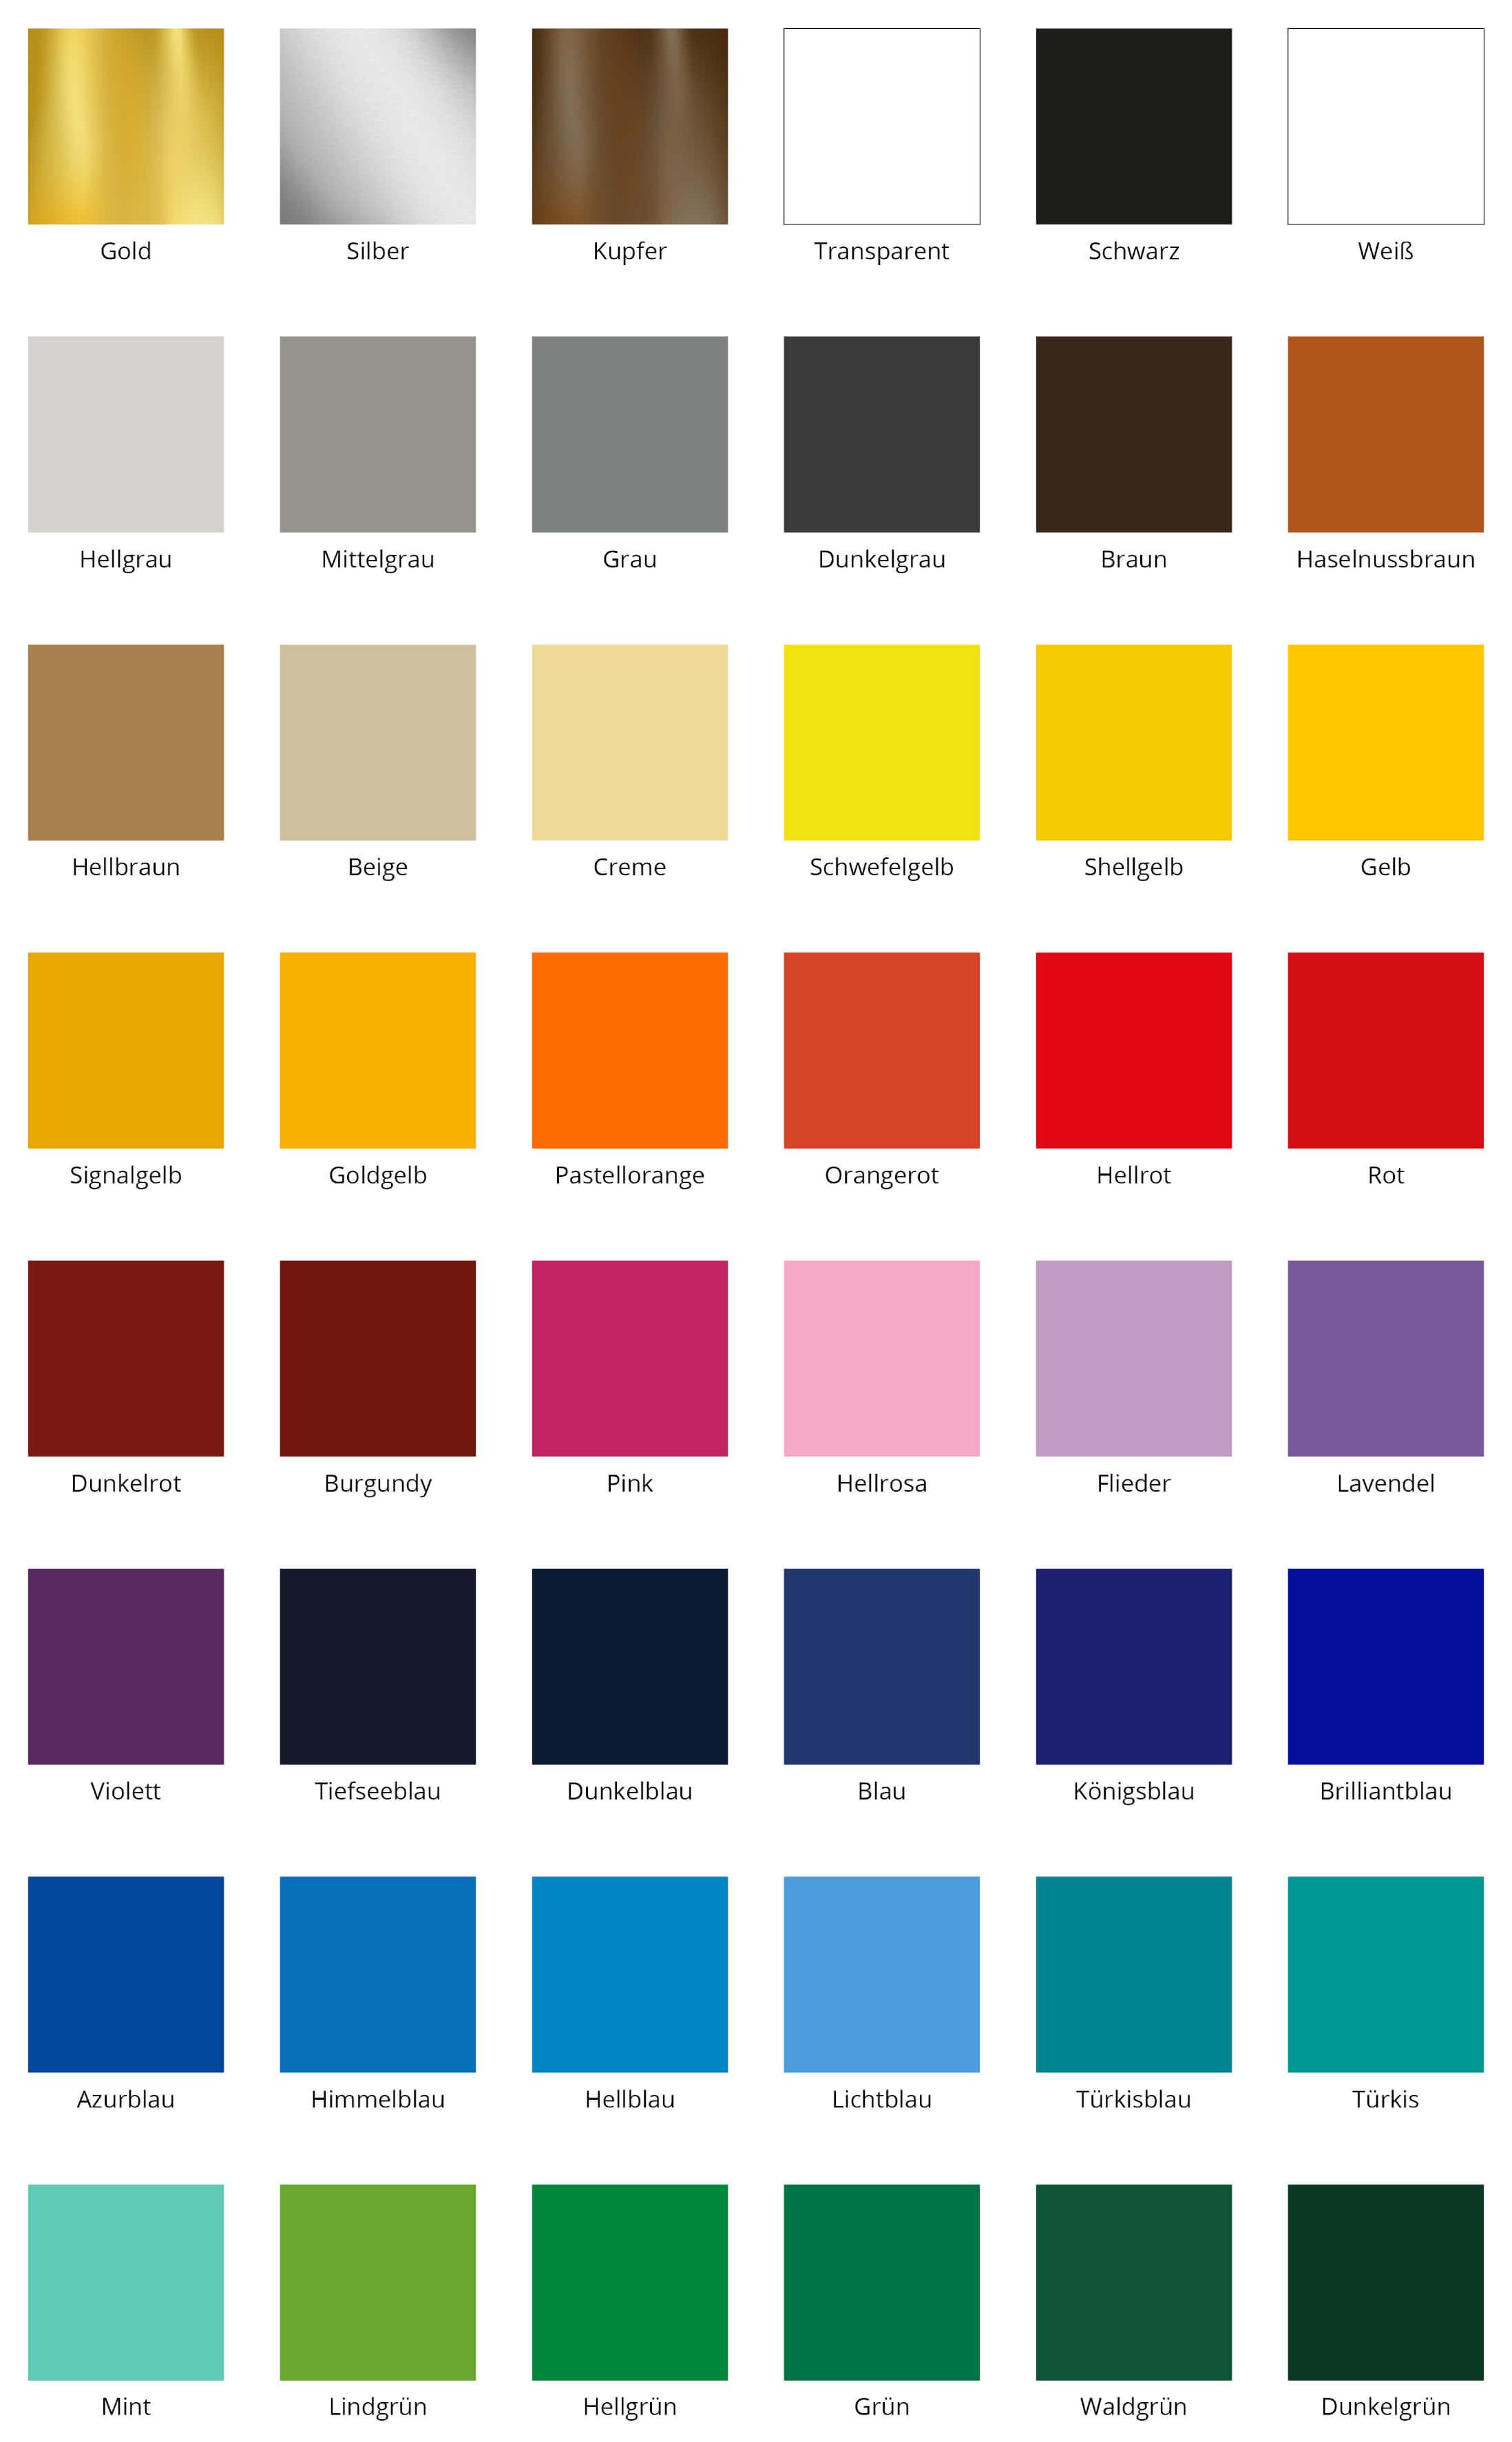 fliesenaufkleber-farbtafel